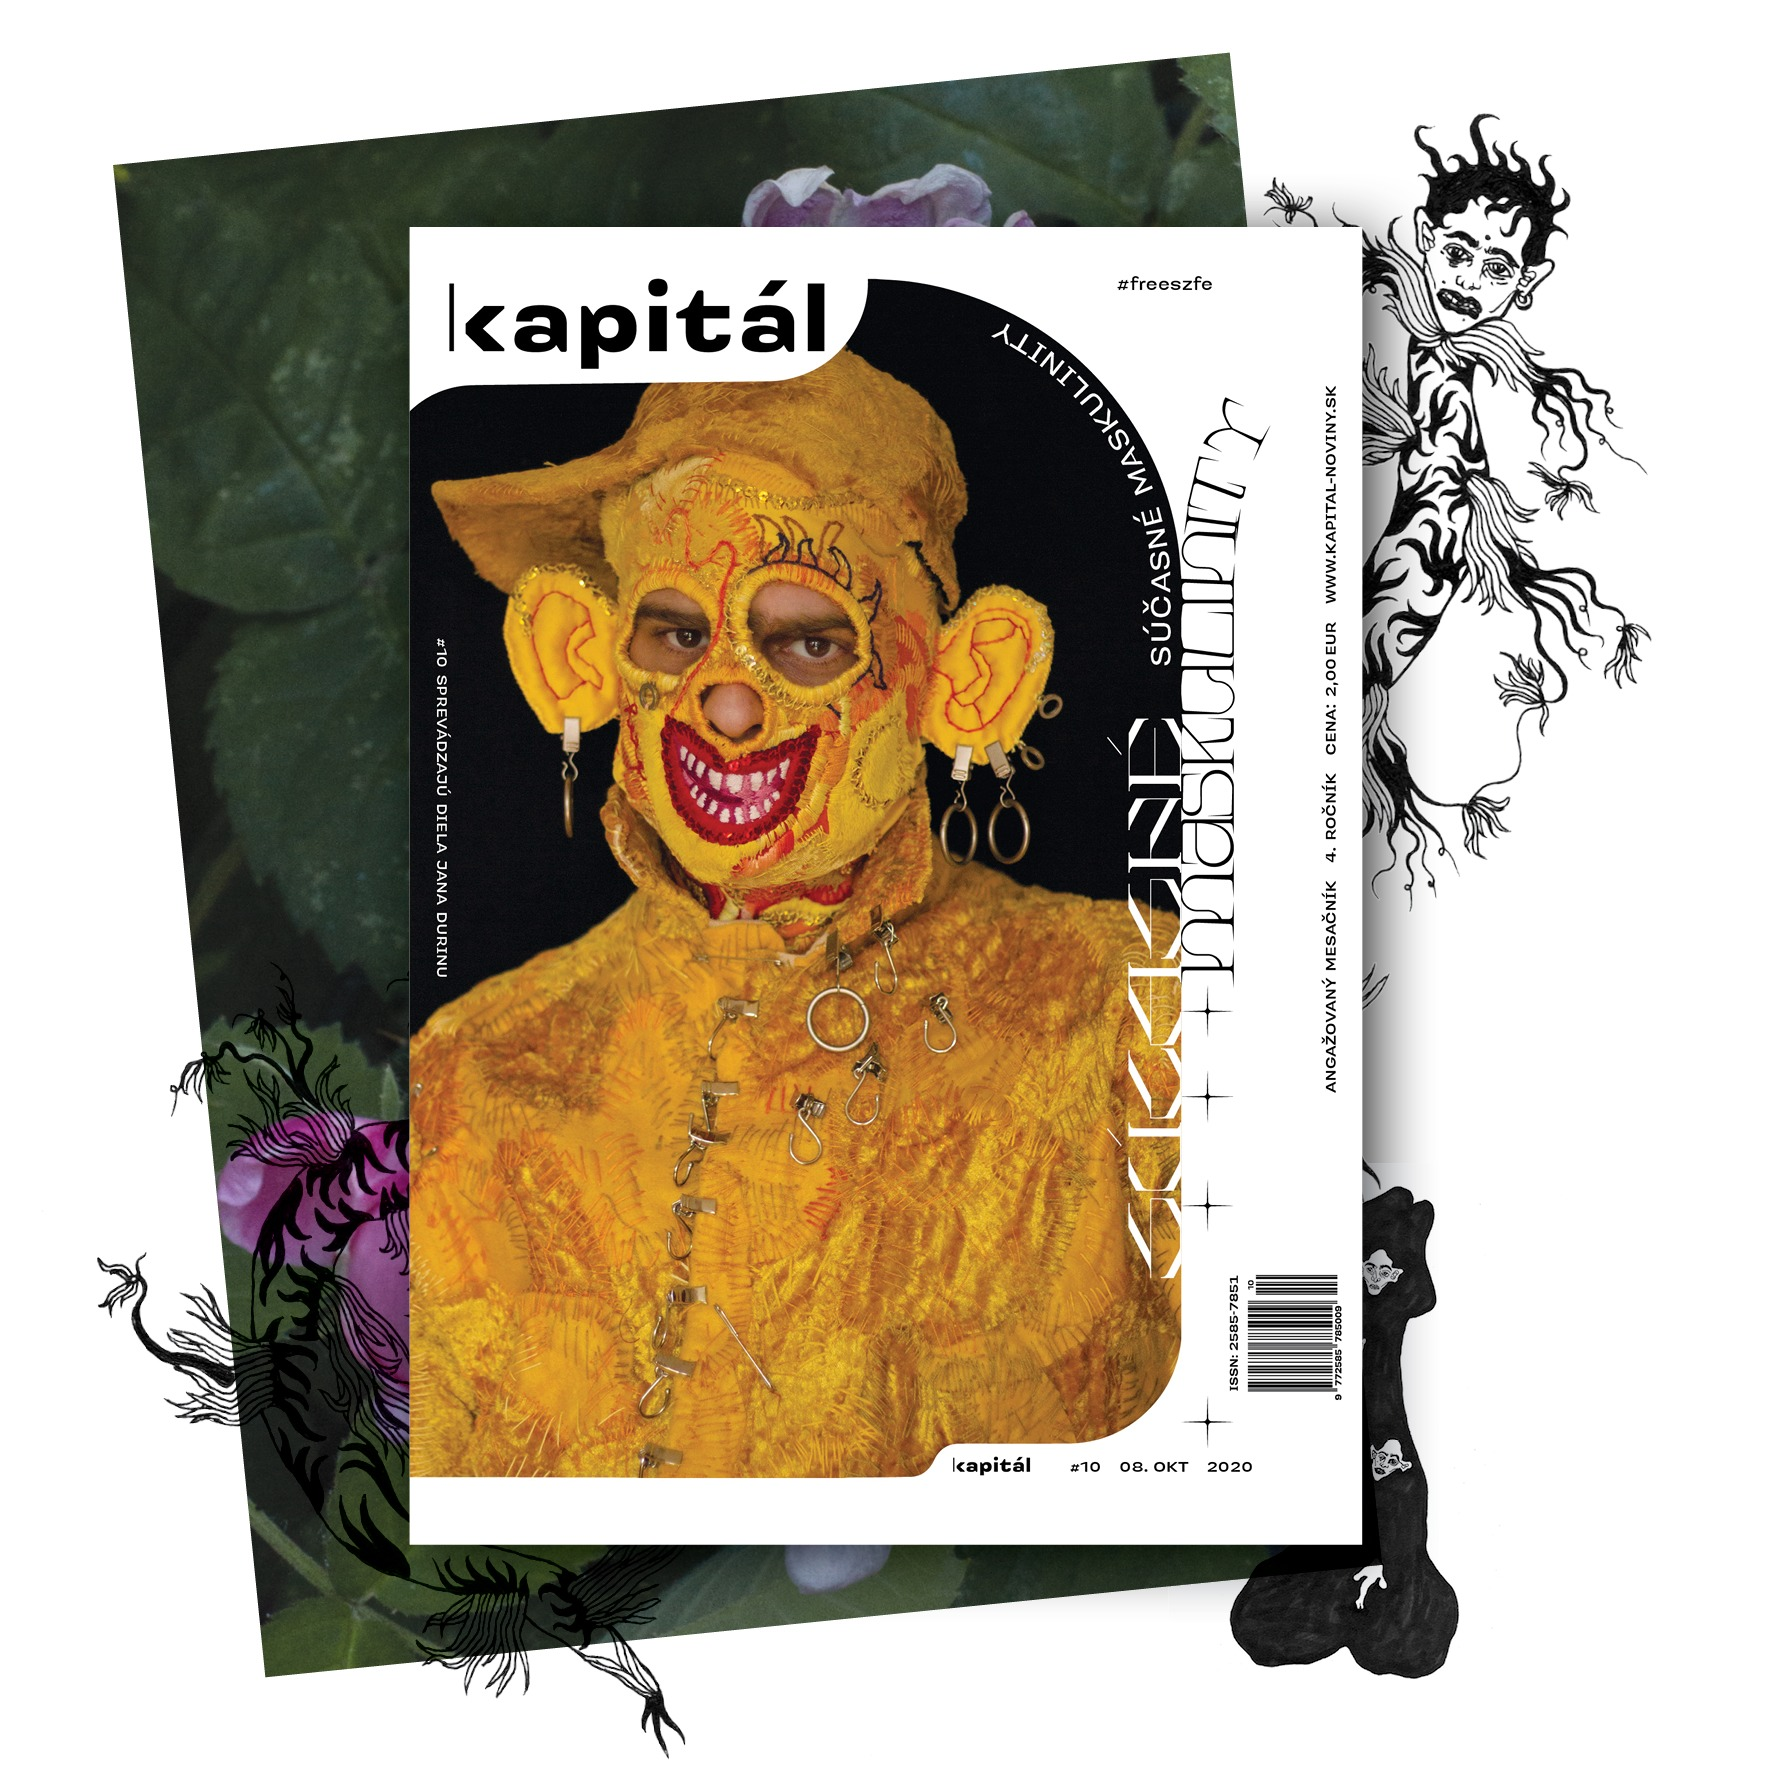 https://kapital-noviny.sk/wp-content/uploads/2020/10/KAPITAL-WEB_PROFILOVKY-CISIEL_2020_10_SUCASNE-MASKULINITY.jpg